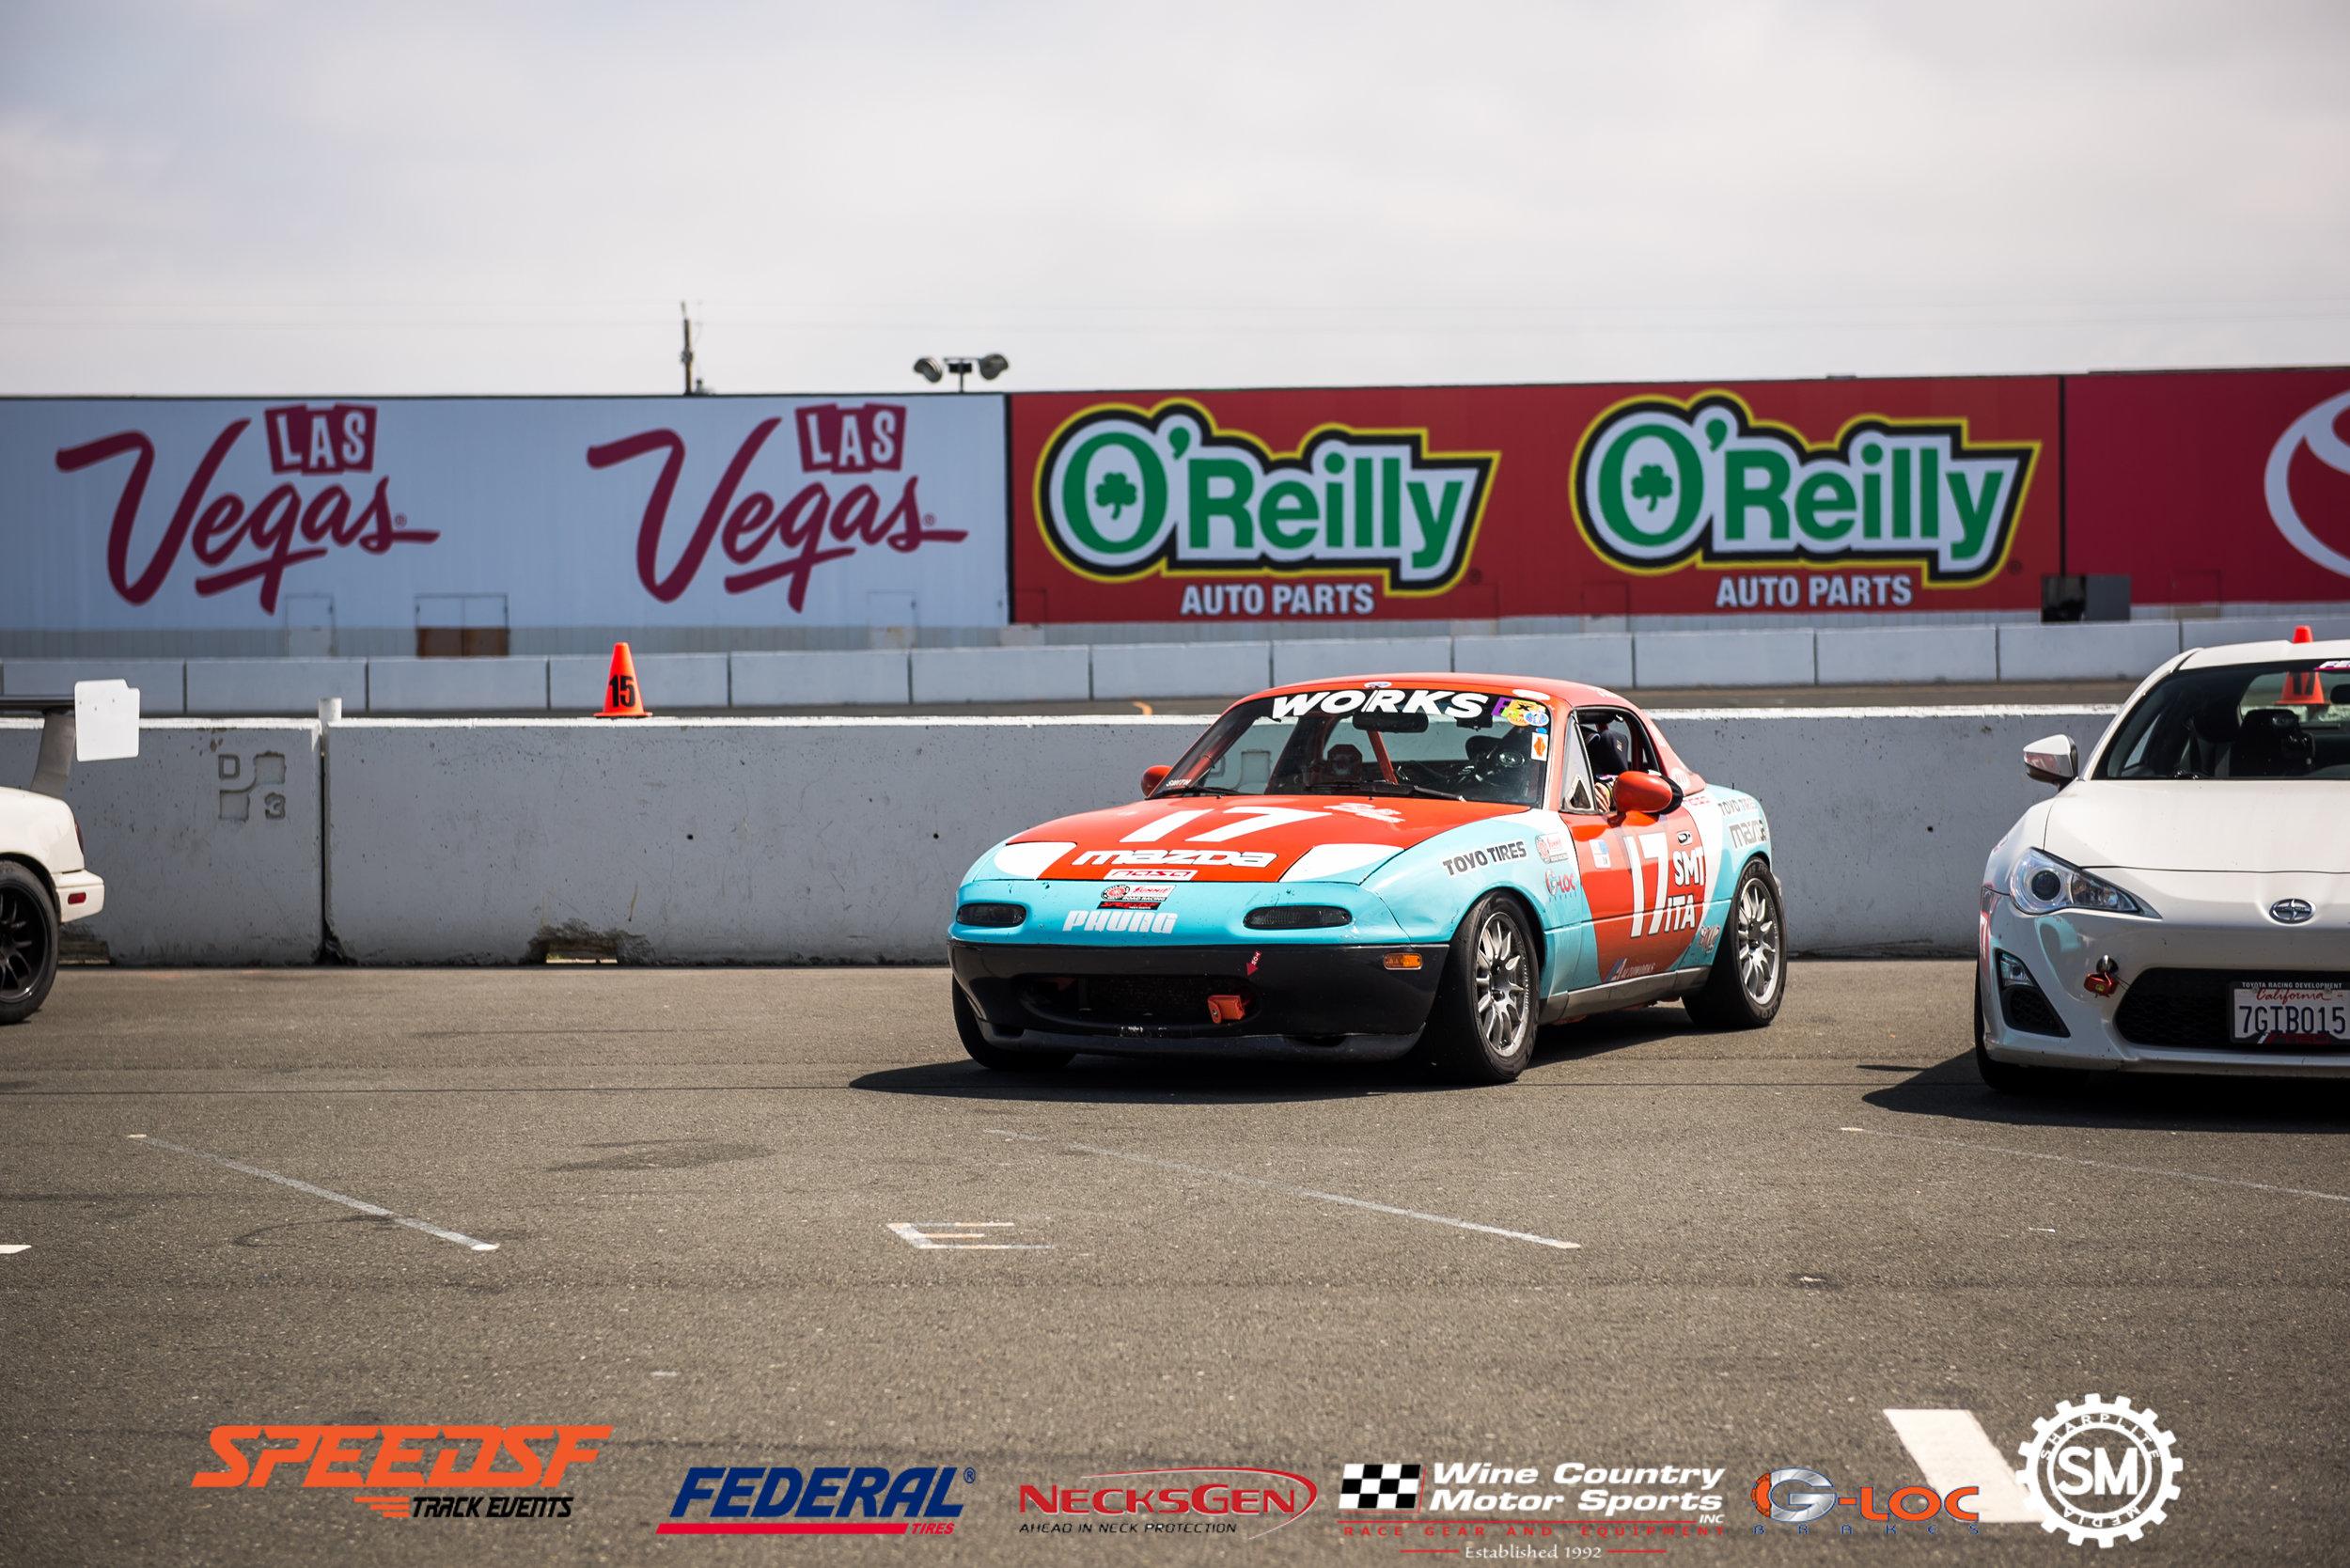 Sonoma Raceway_Monday_SpeedSF_PADDOCK-20.jpg